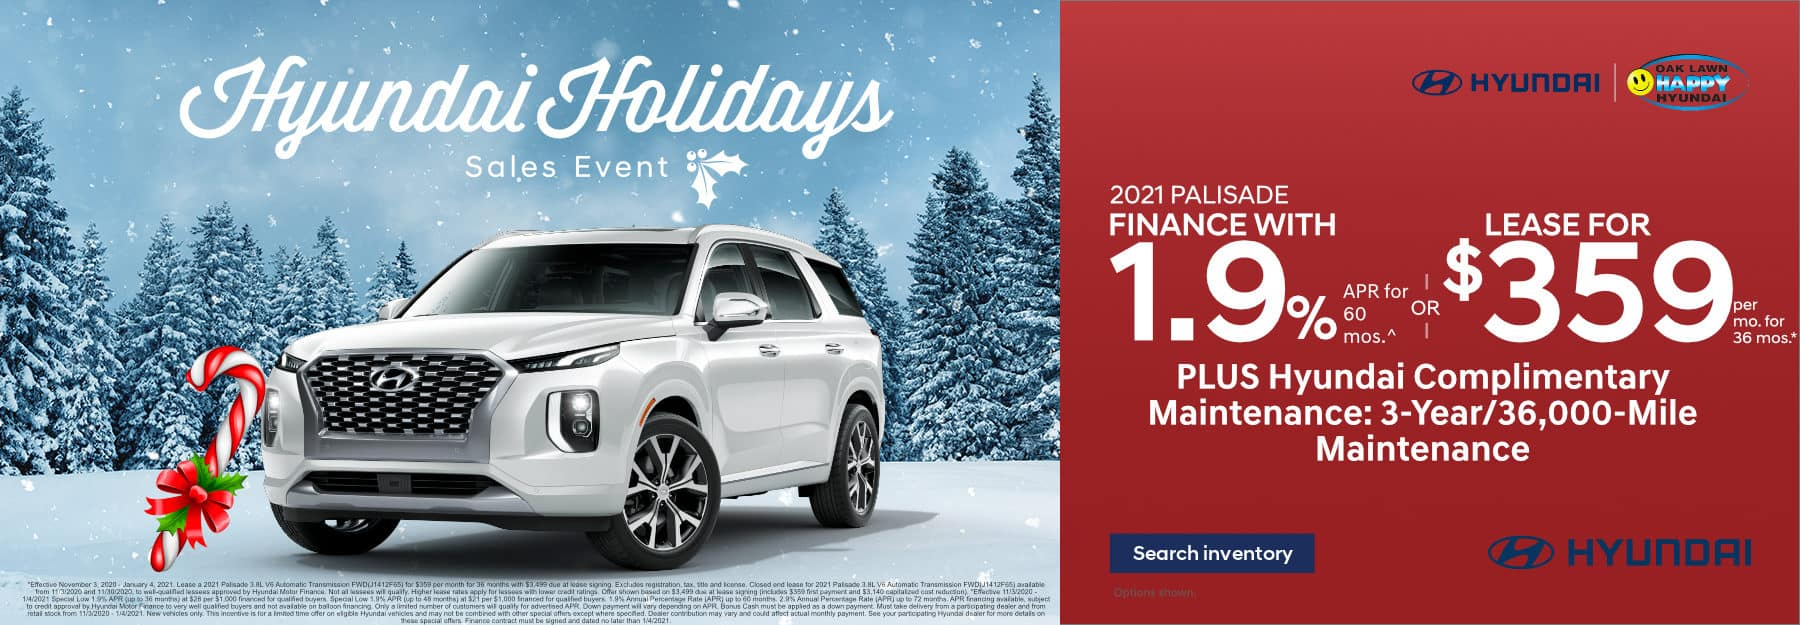 December-2020_2021_Palisade_Happy_Hyundai